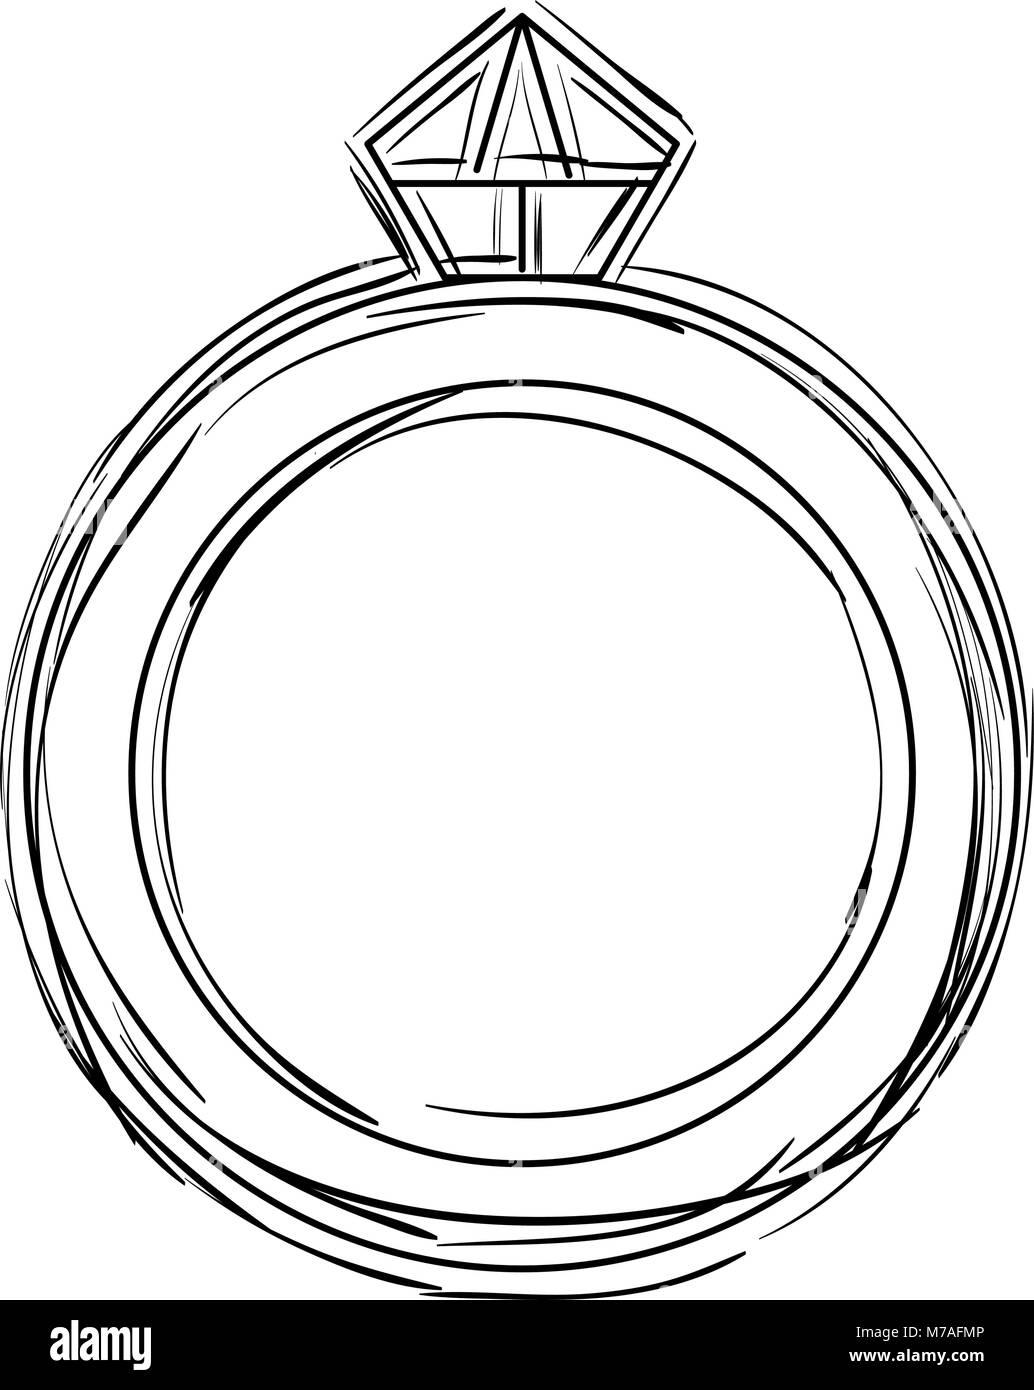 ring with diamond luxury icon - Stock Image